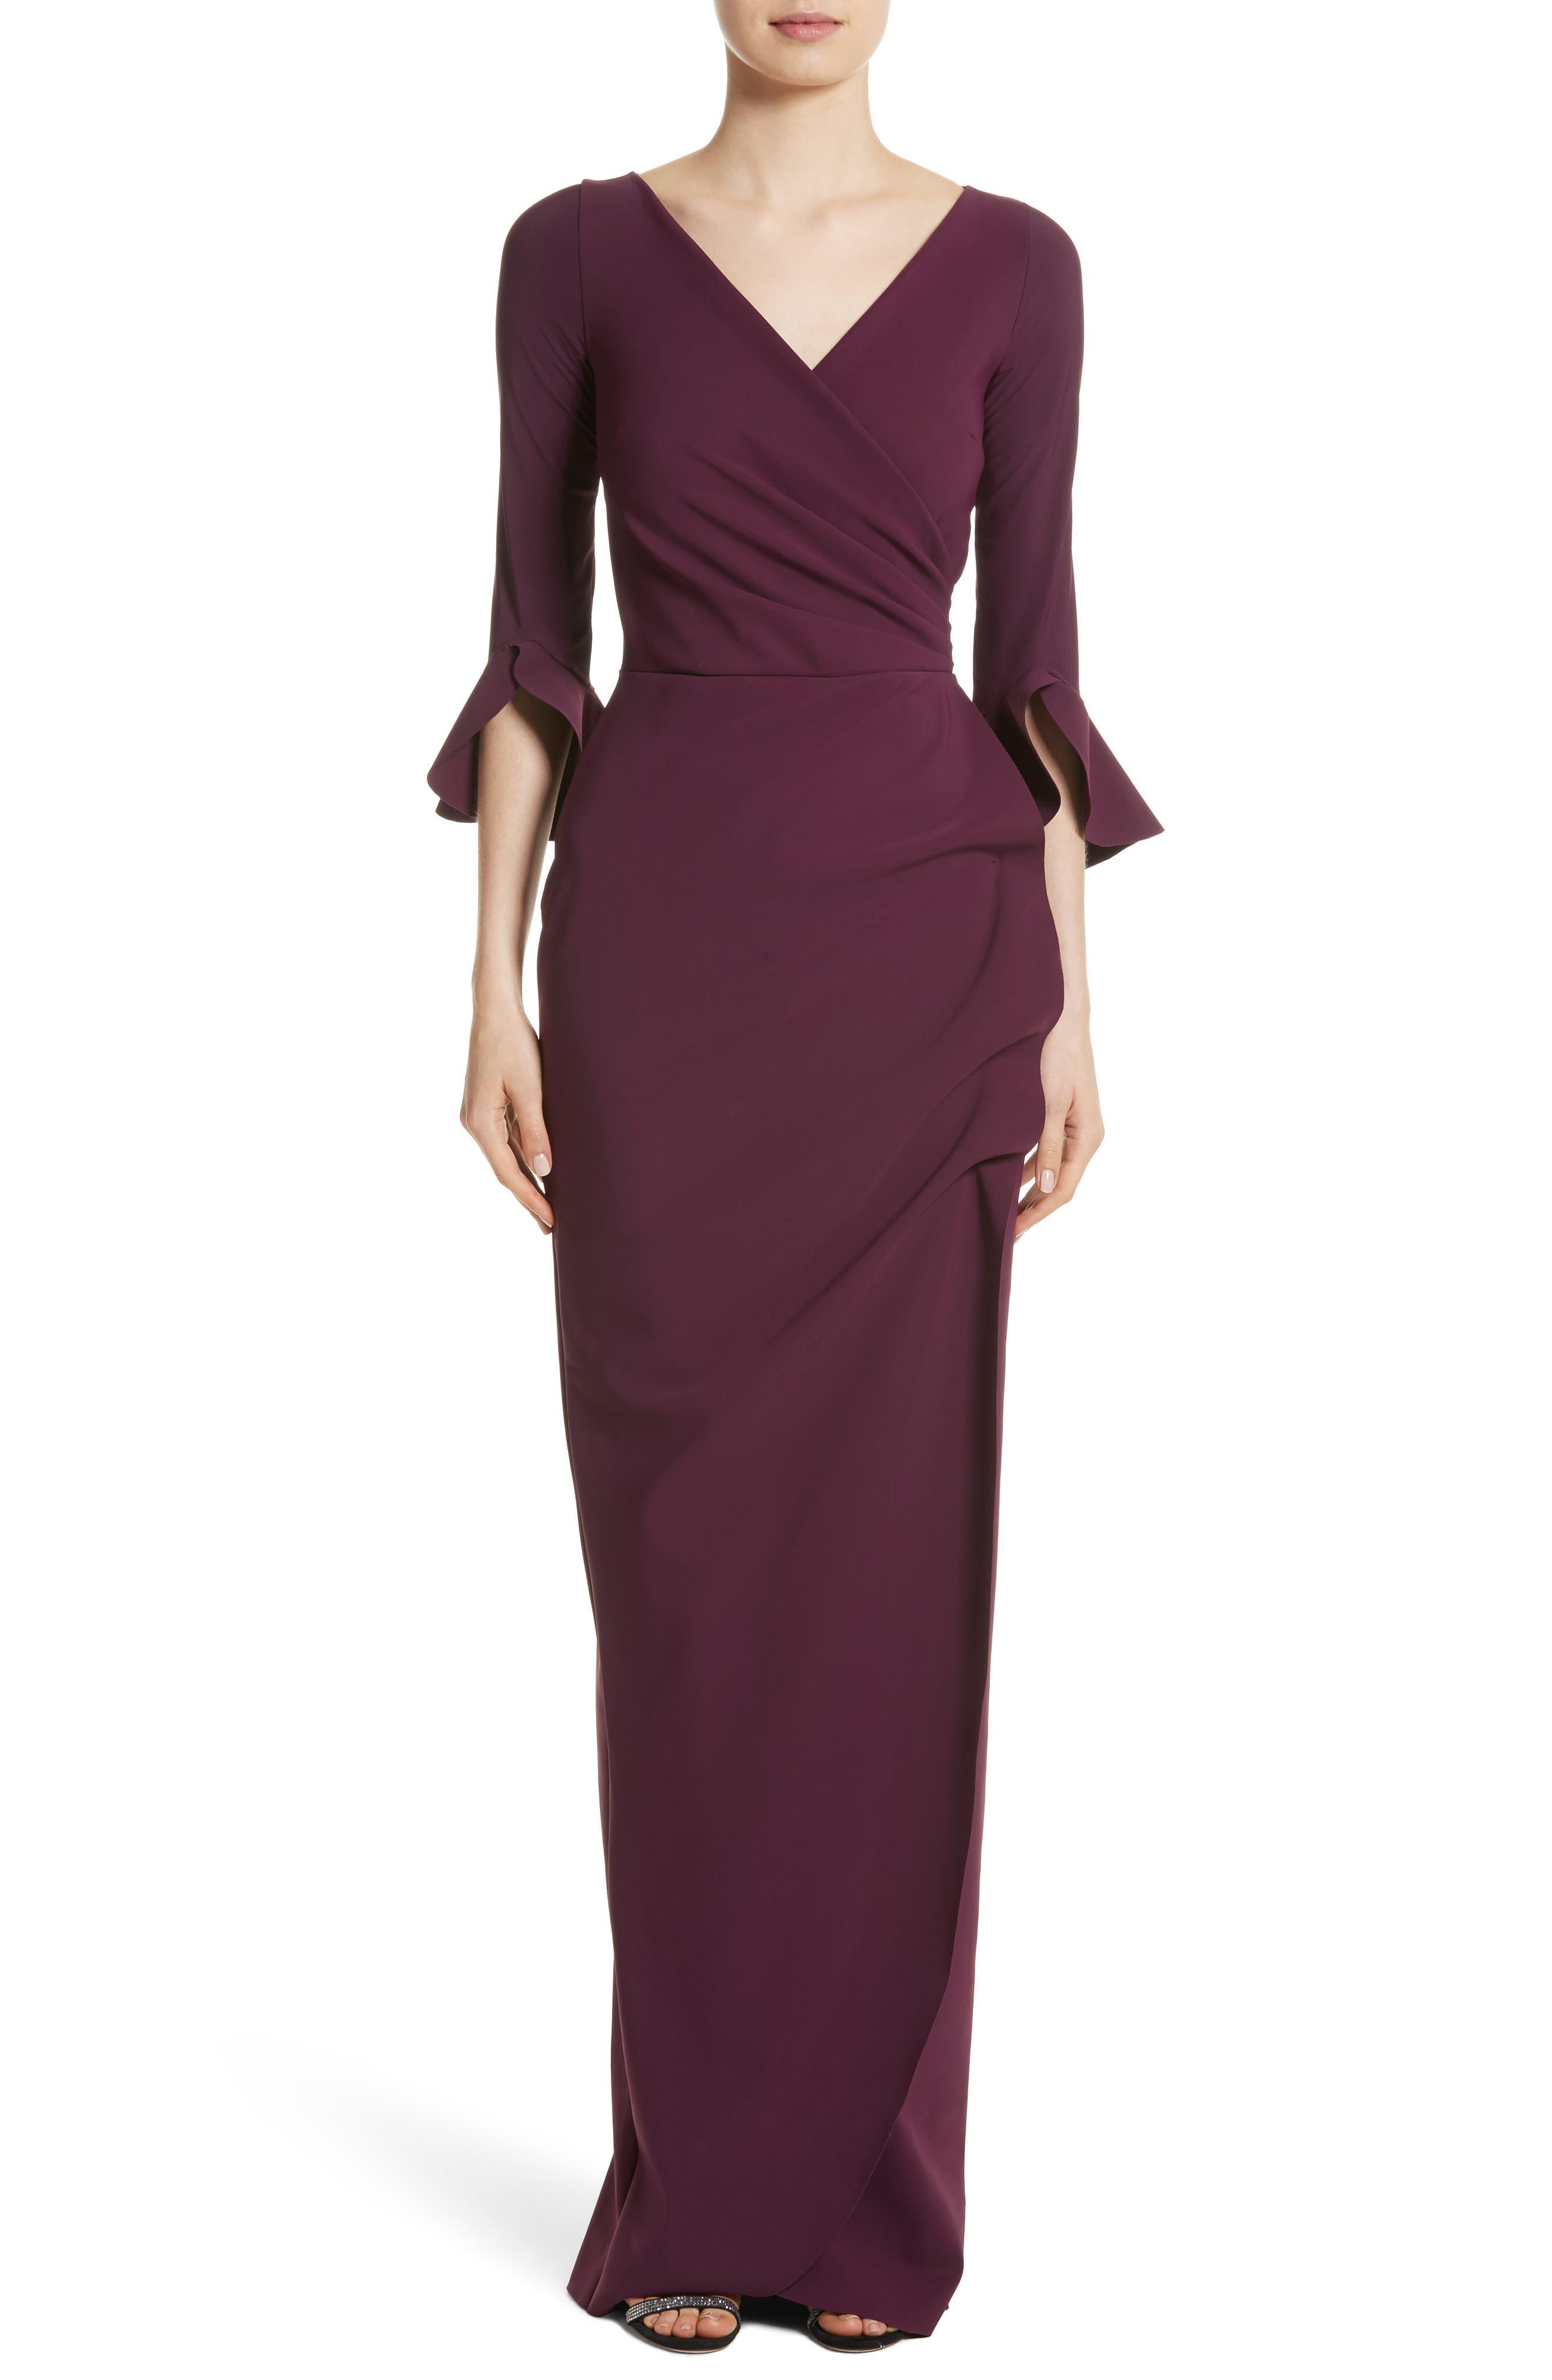 Main Image - Chiara Boni La Petite Robe Ruffle Cuff Side Drape Gown